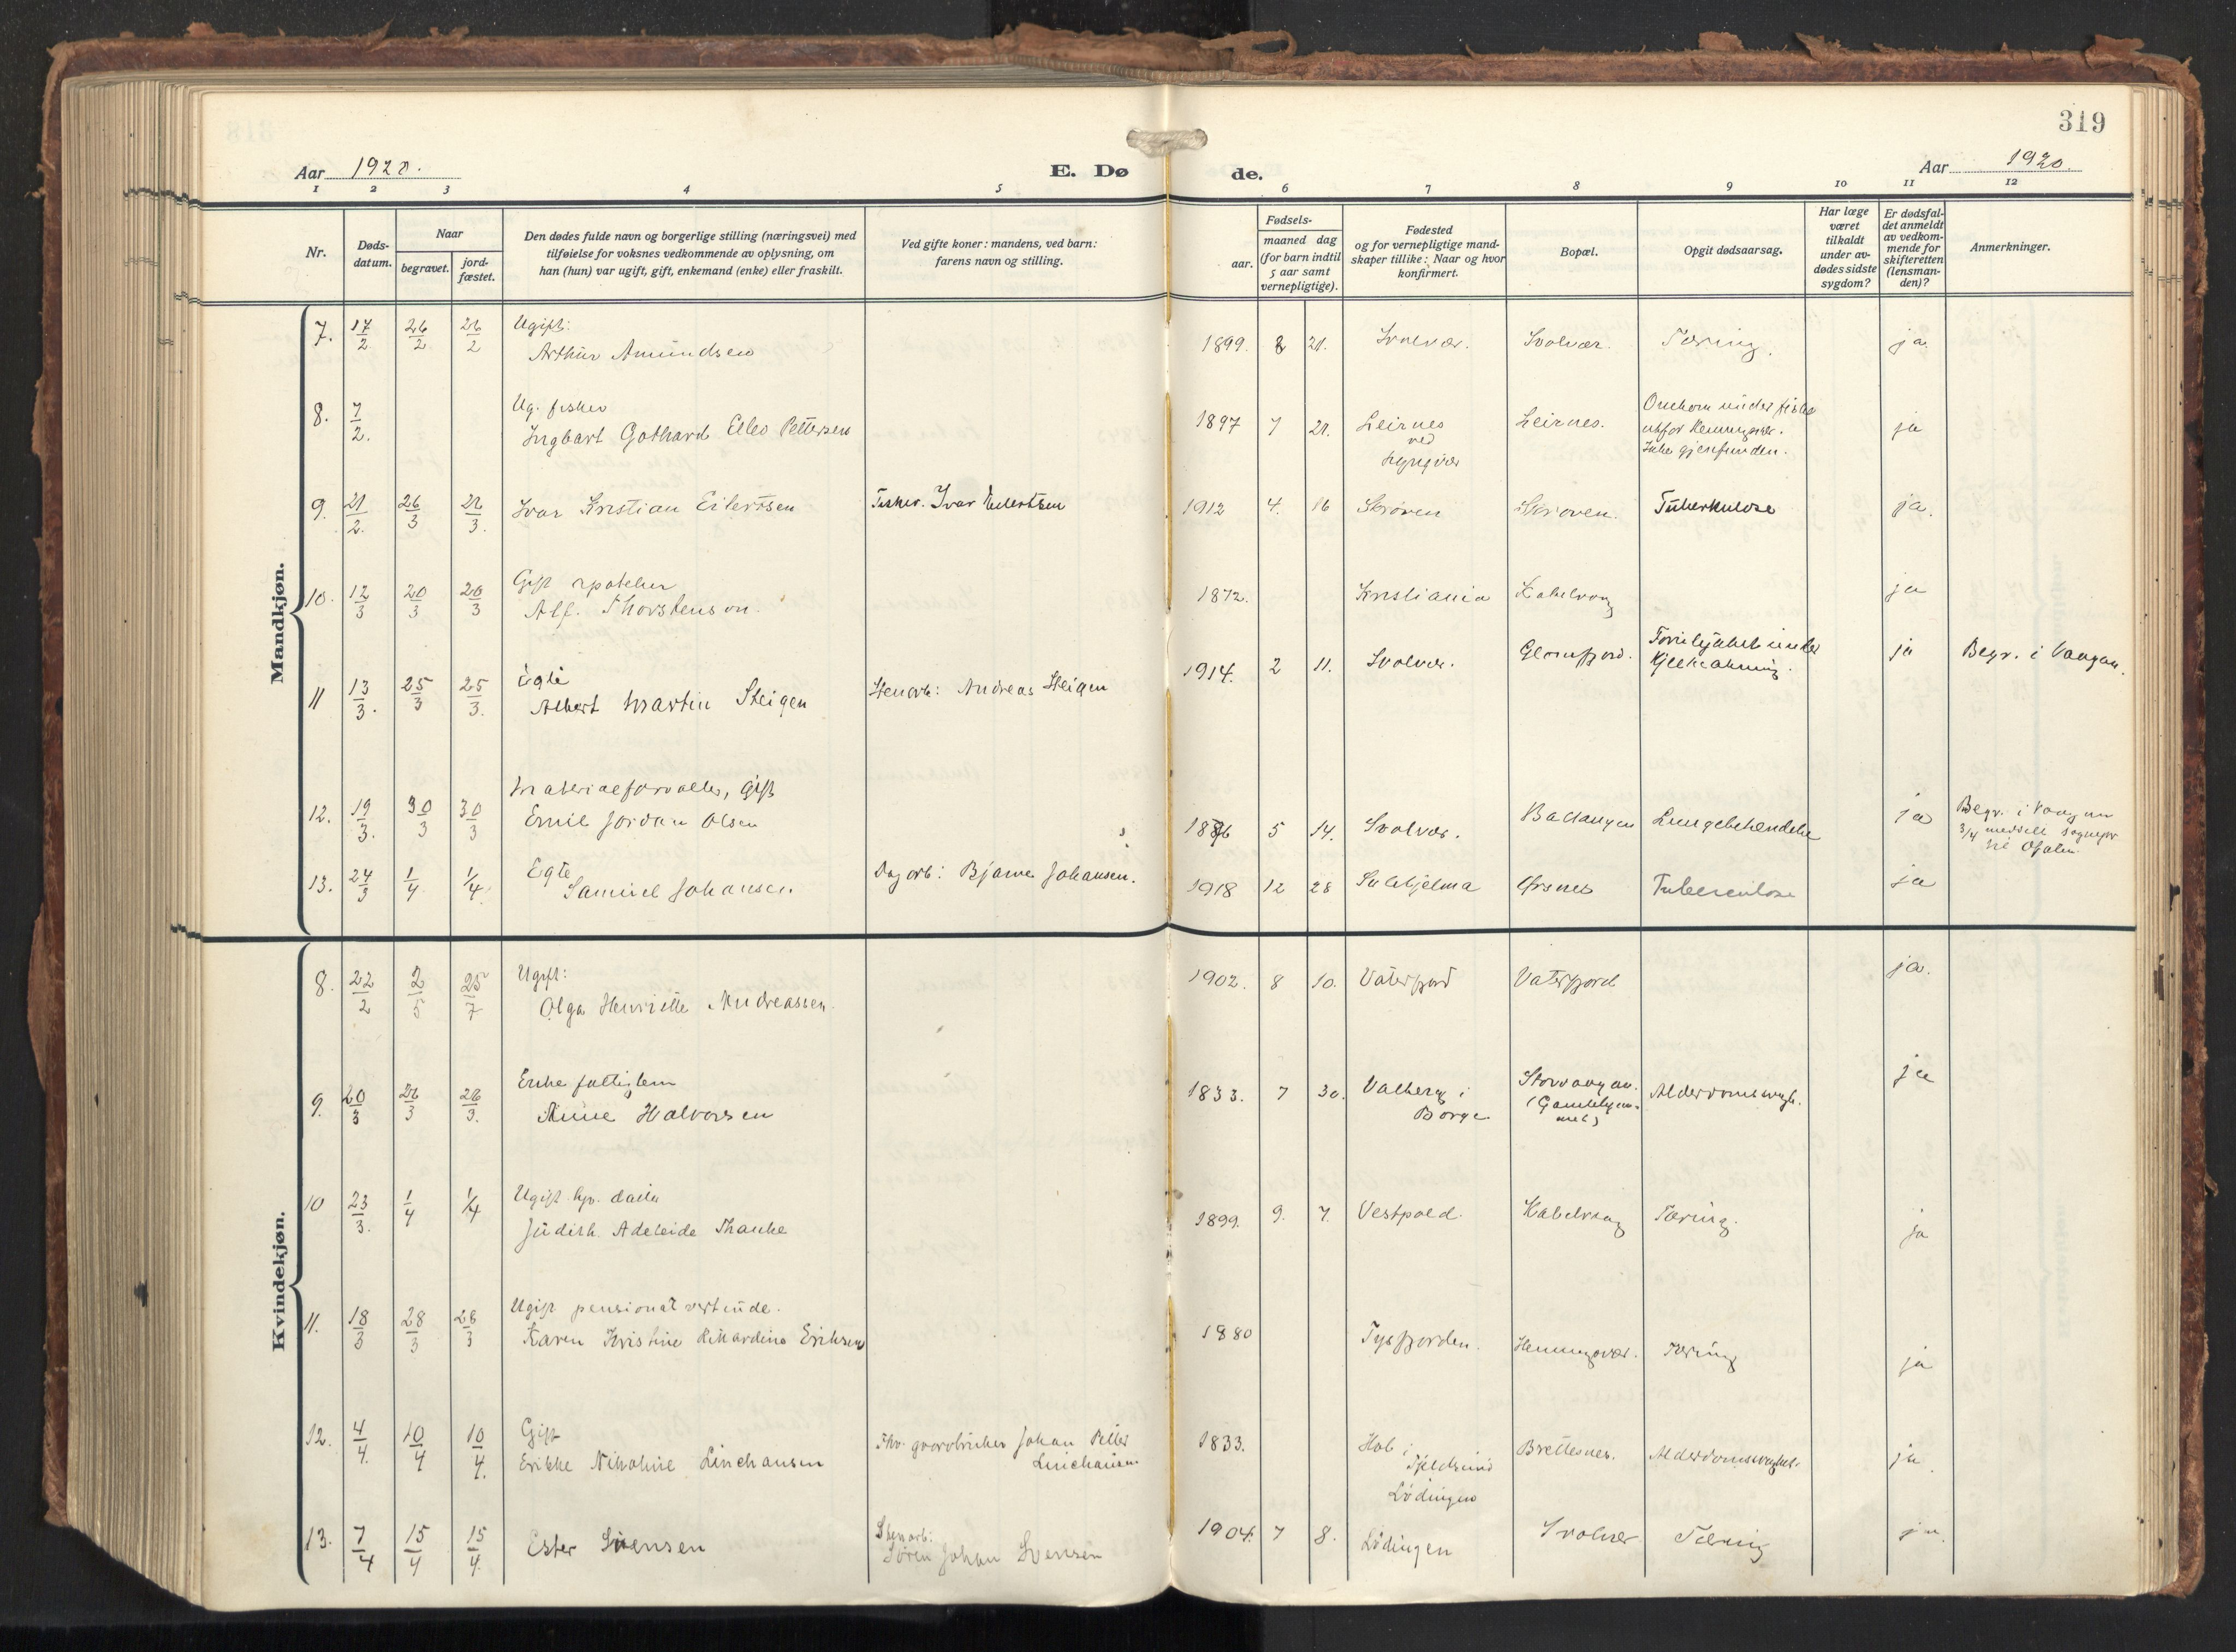 SAT, Ministerialprotokoller, klokkerbøker og fødselsregistre - Nordland, 874/L1064: Ministerialbok nr. 874A08, 1915-1926, s. 319